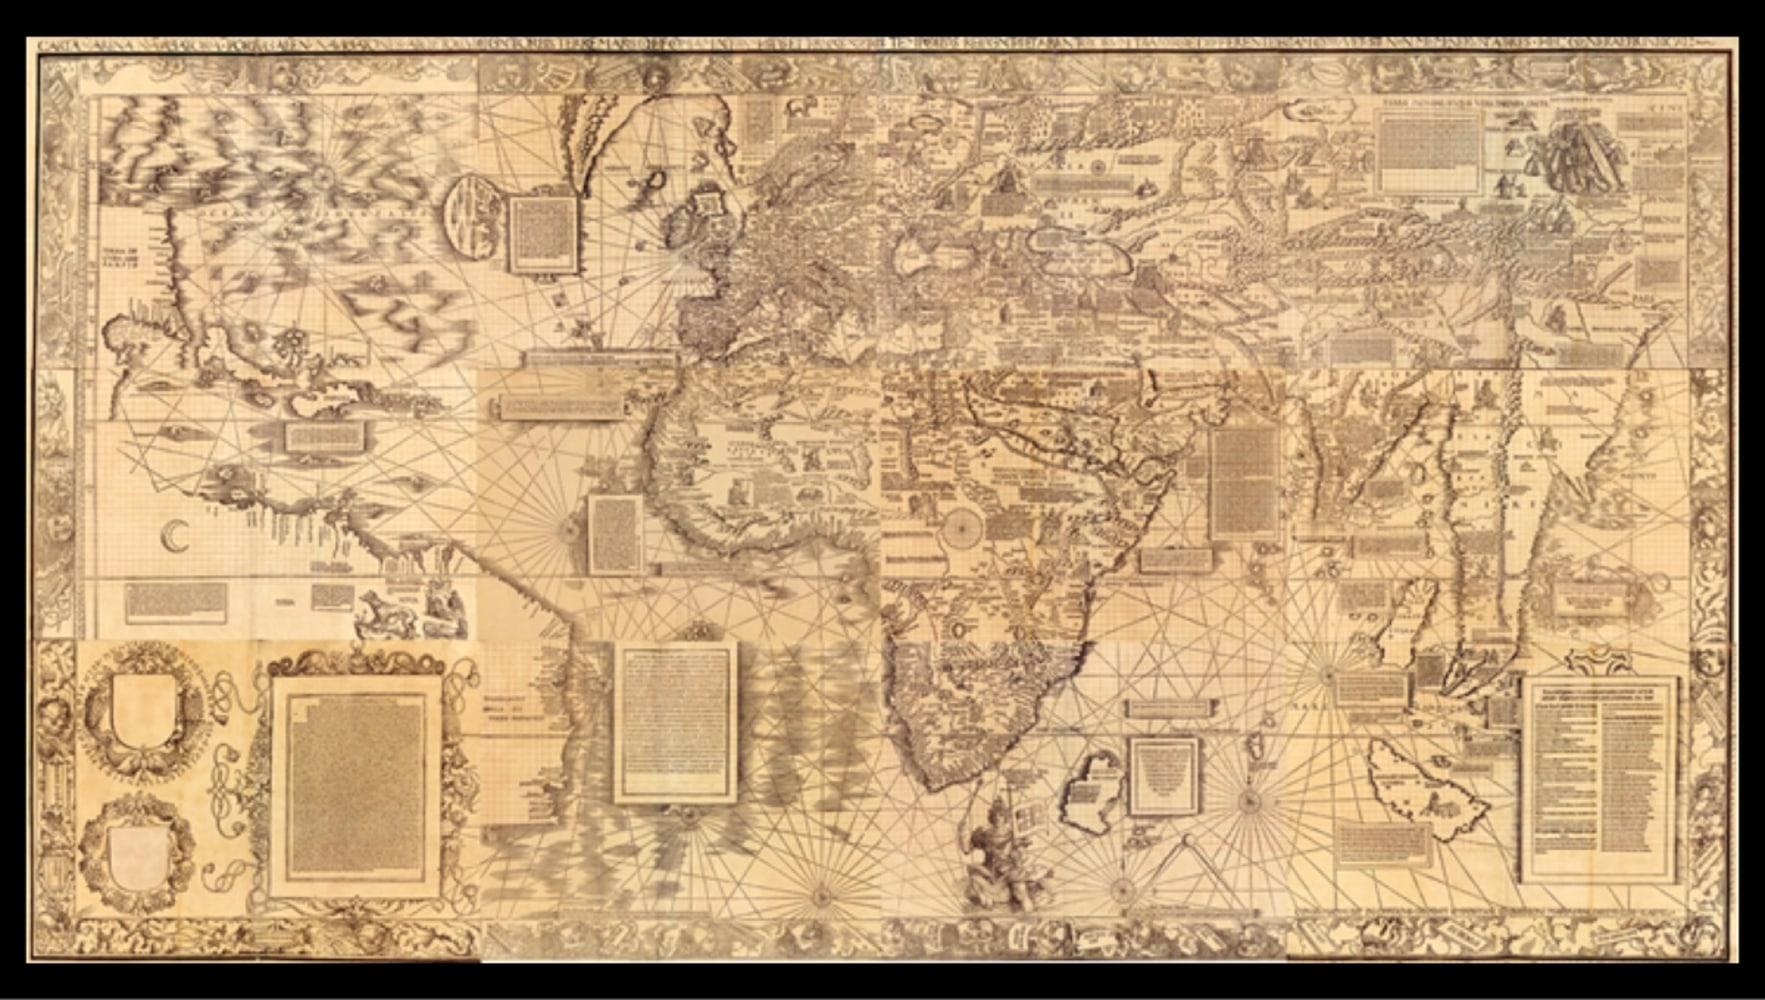 Mysterious renaissance map charts cartographer's methods   NBC News